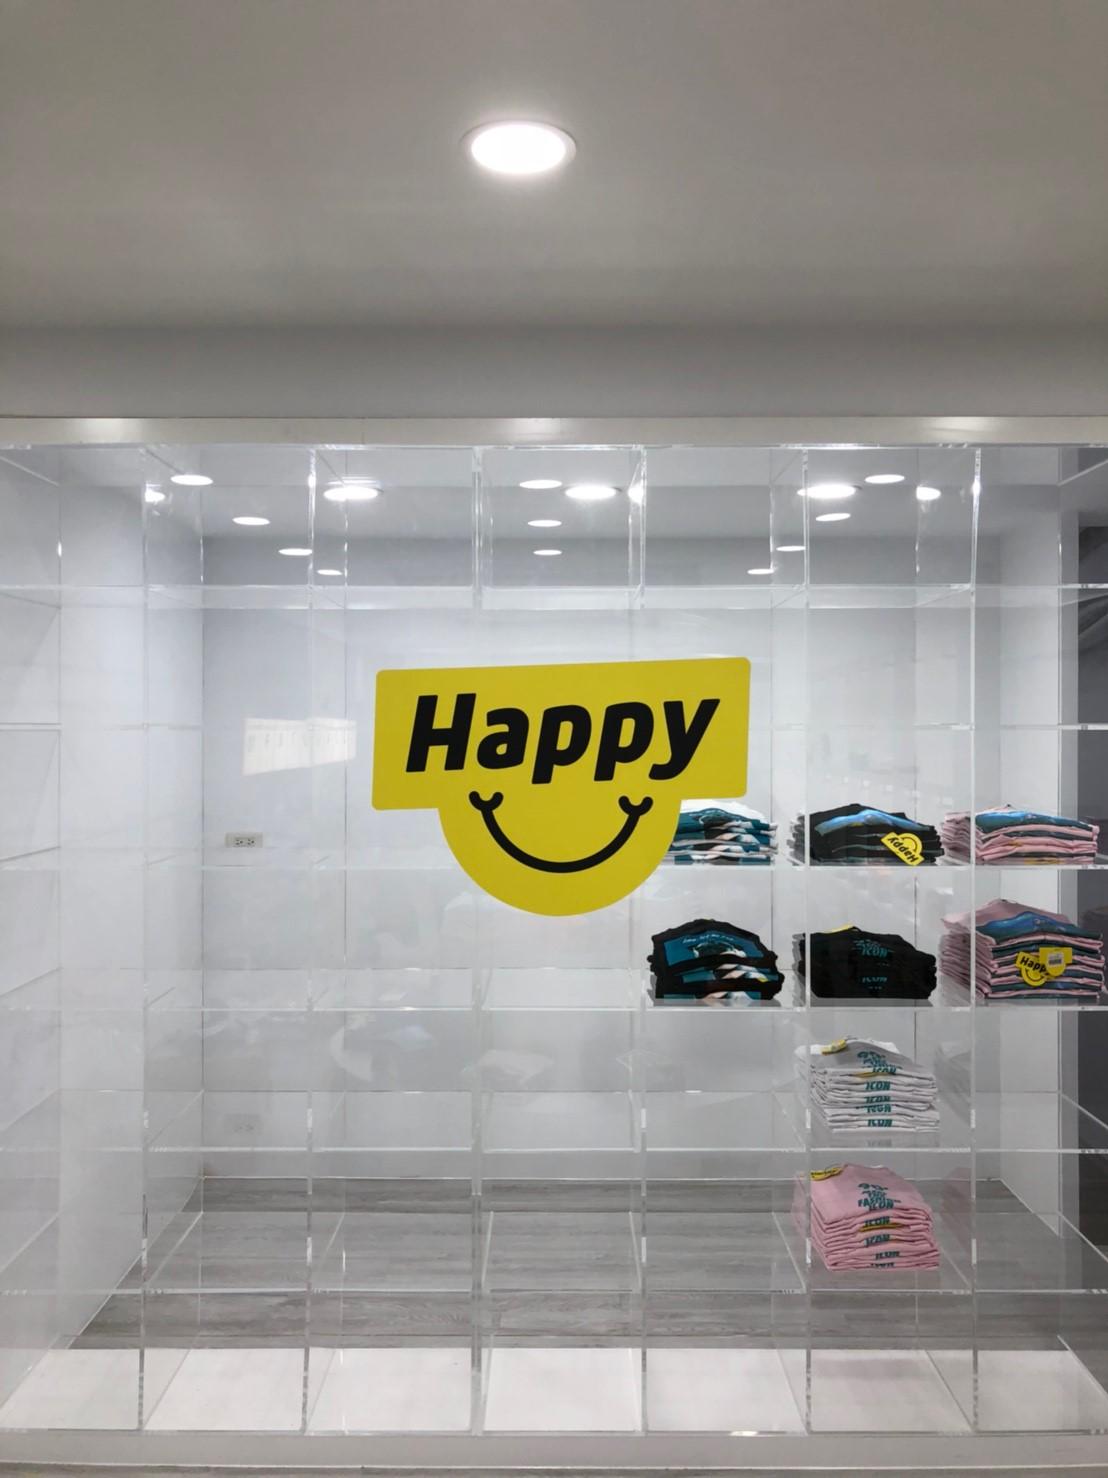 潮牌 Happy 士林大東店